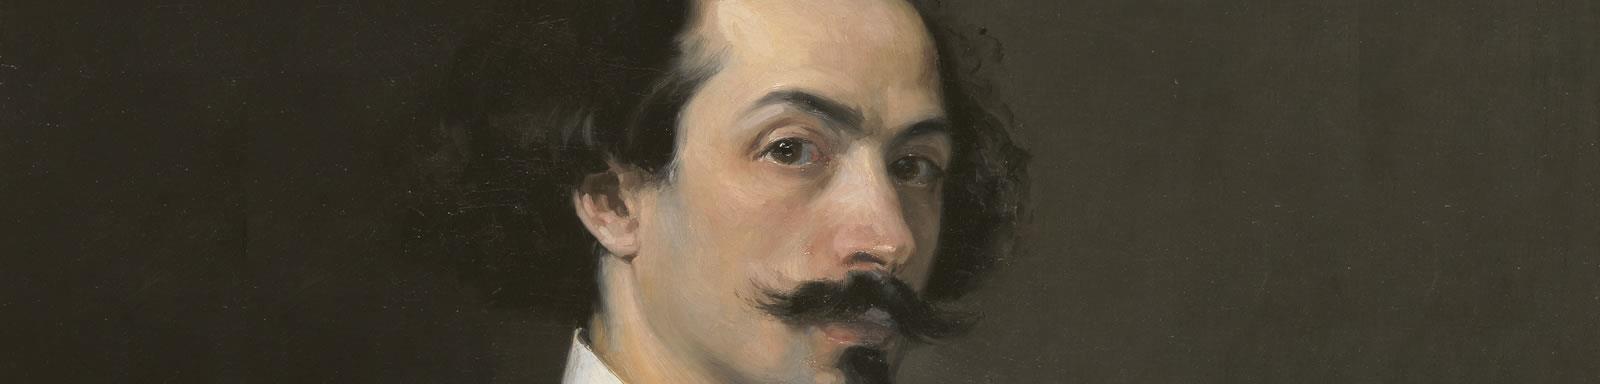 Moreno González, Matías